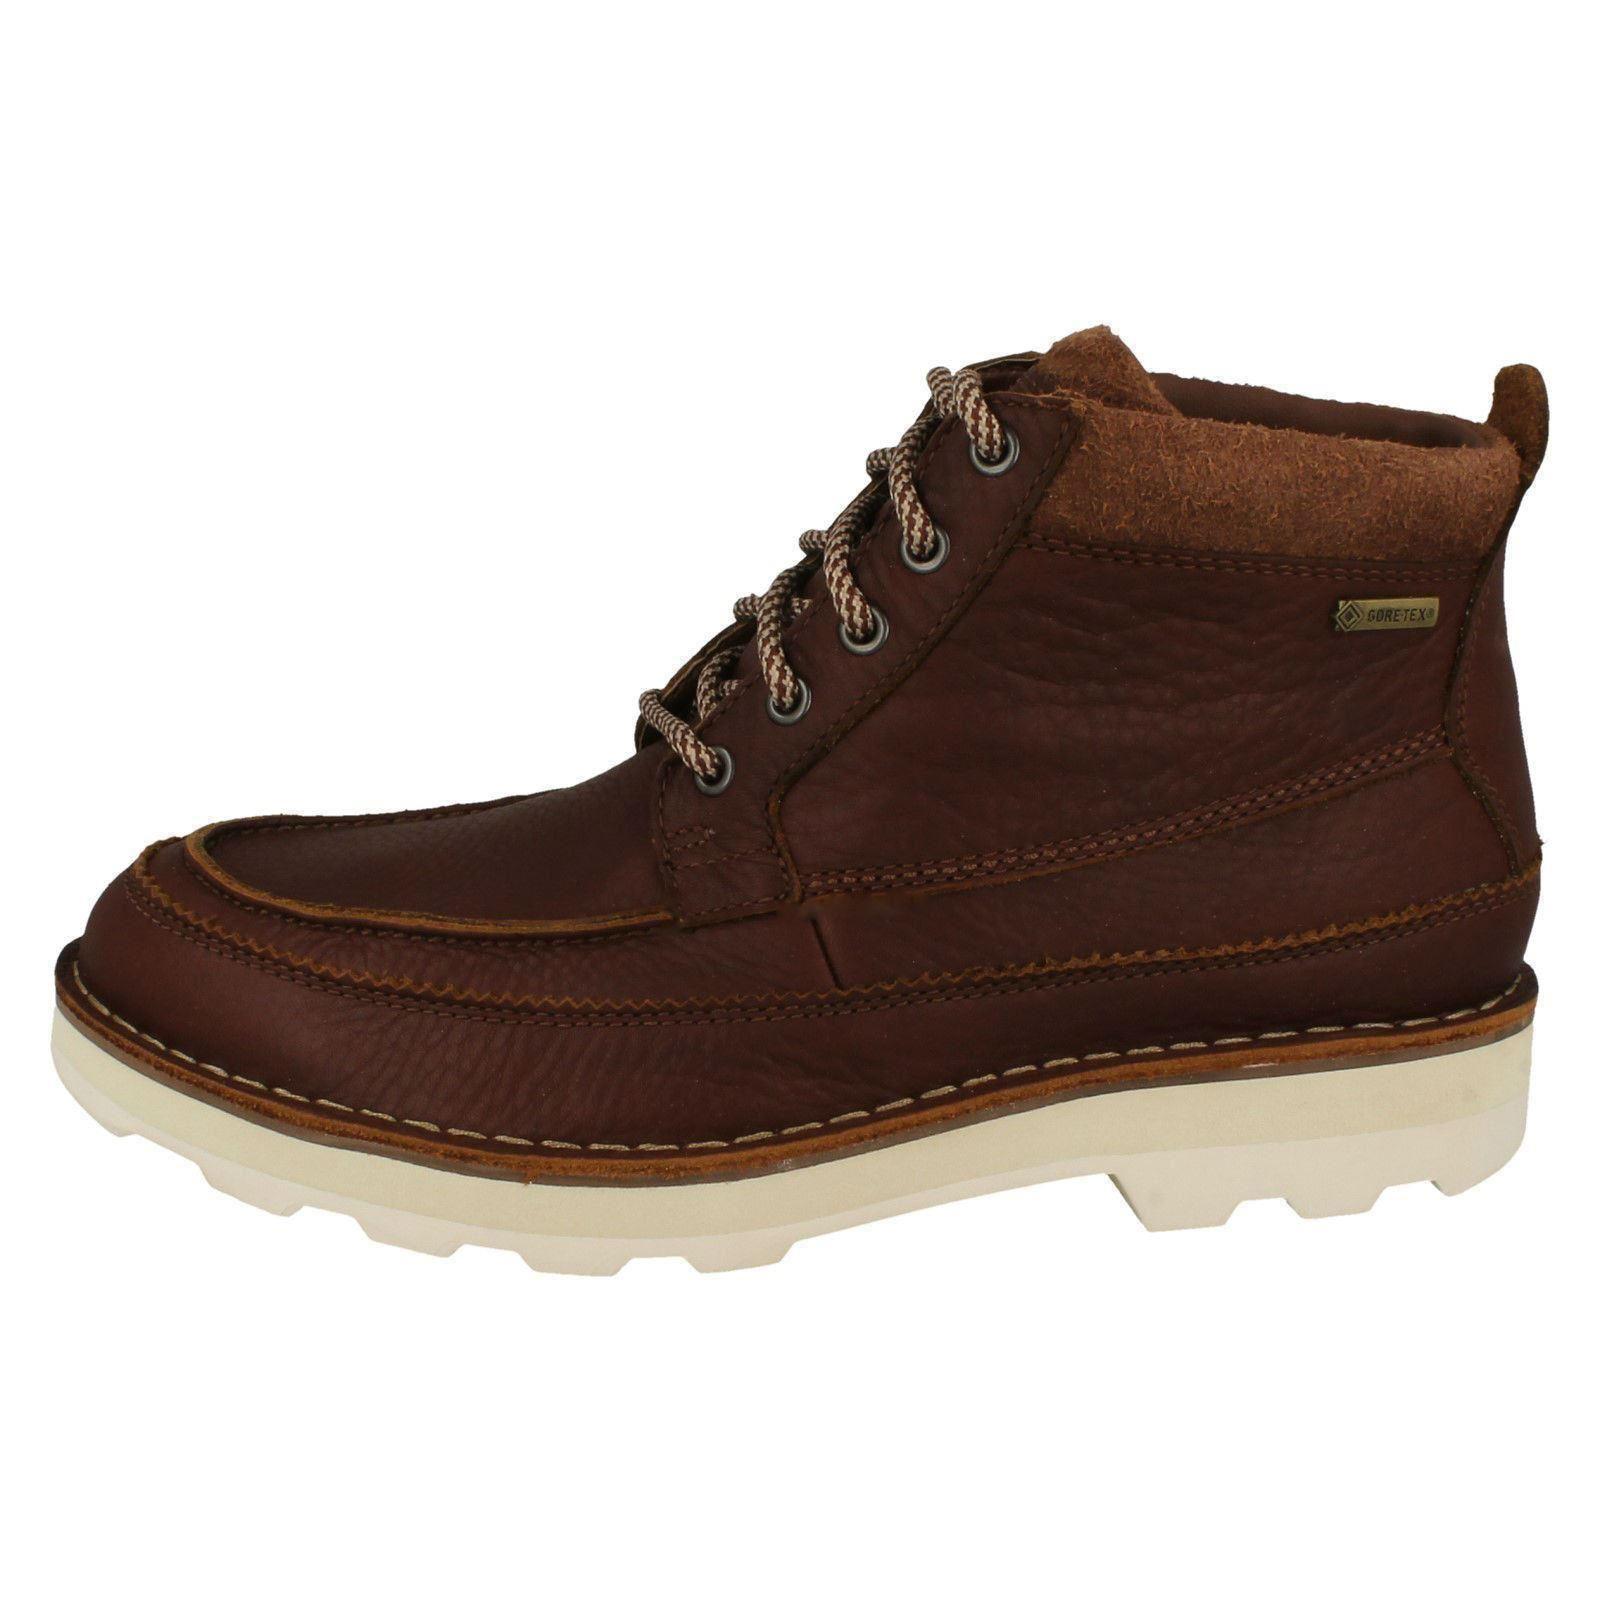 Mens Clarks Casual Gore-Tex Boots - Korik Rise